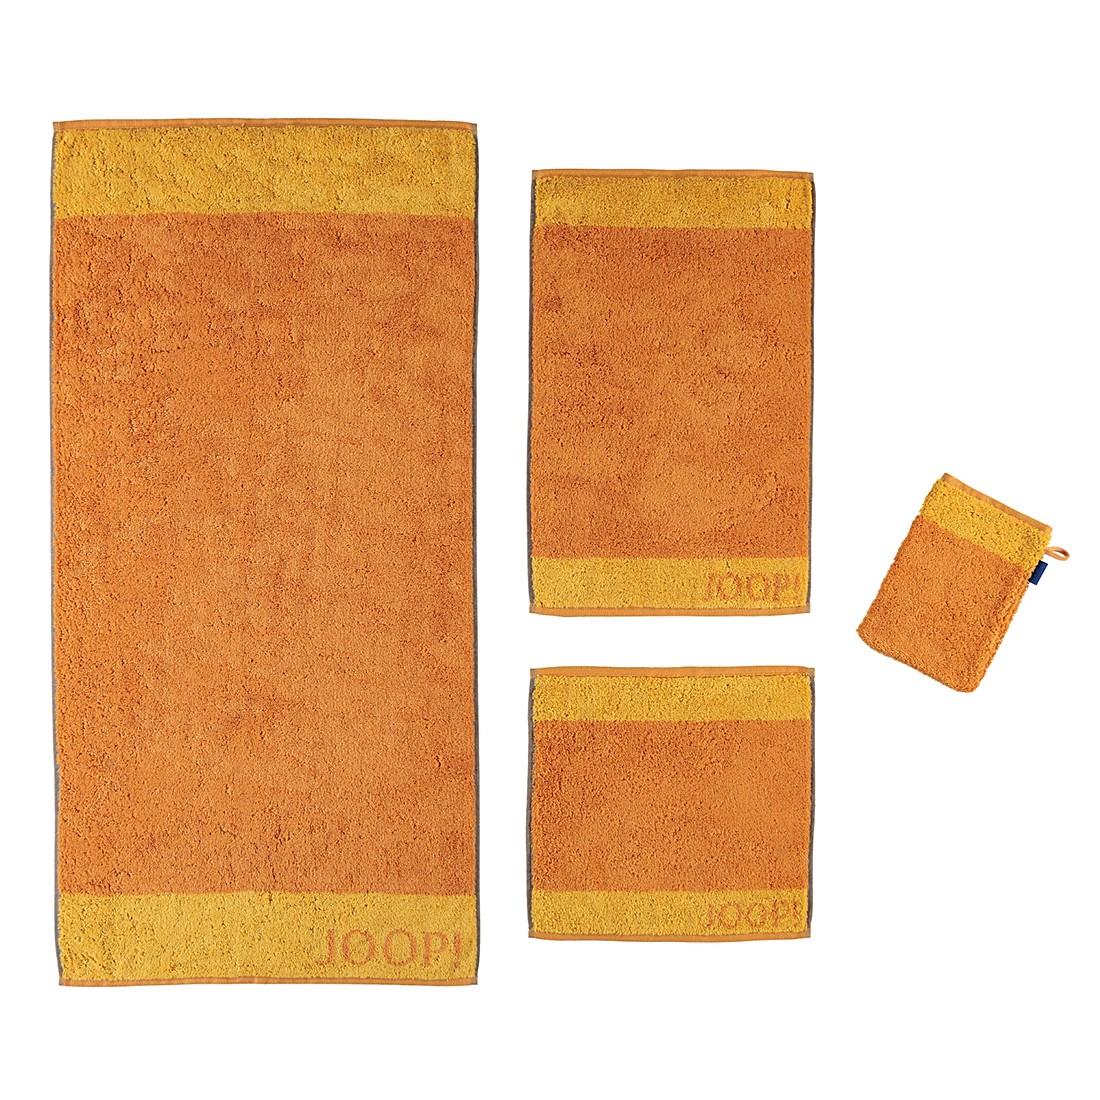 Handtücher Graphic Doubleface 1634 – Baumwolle – Cognac – Gästetuch 30×50 cm, Joop jetzt kaufen